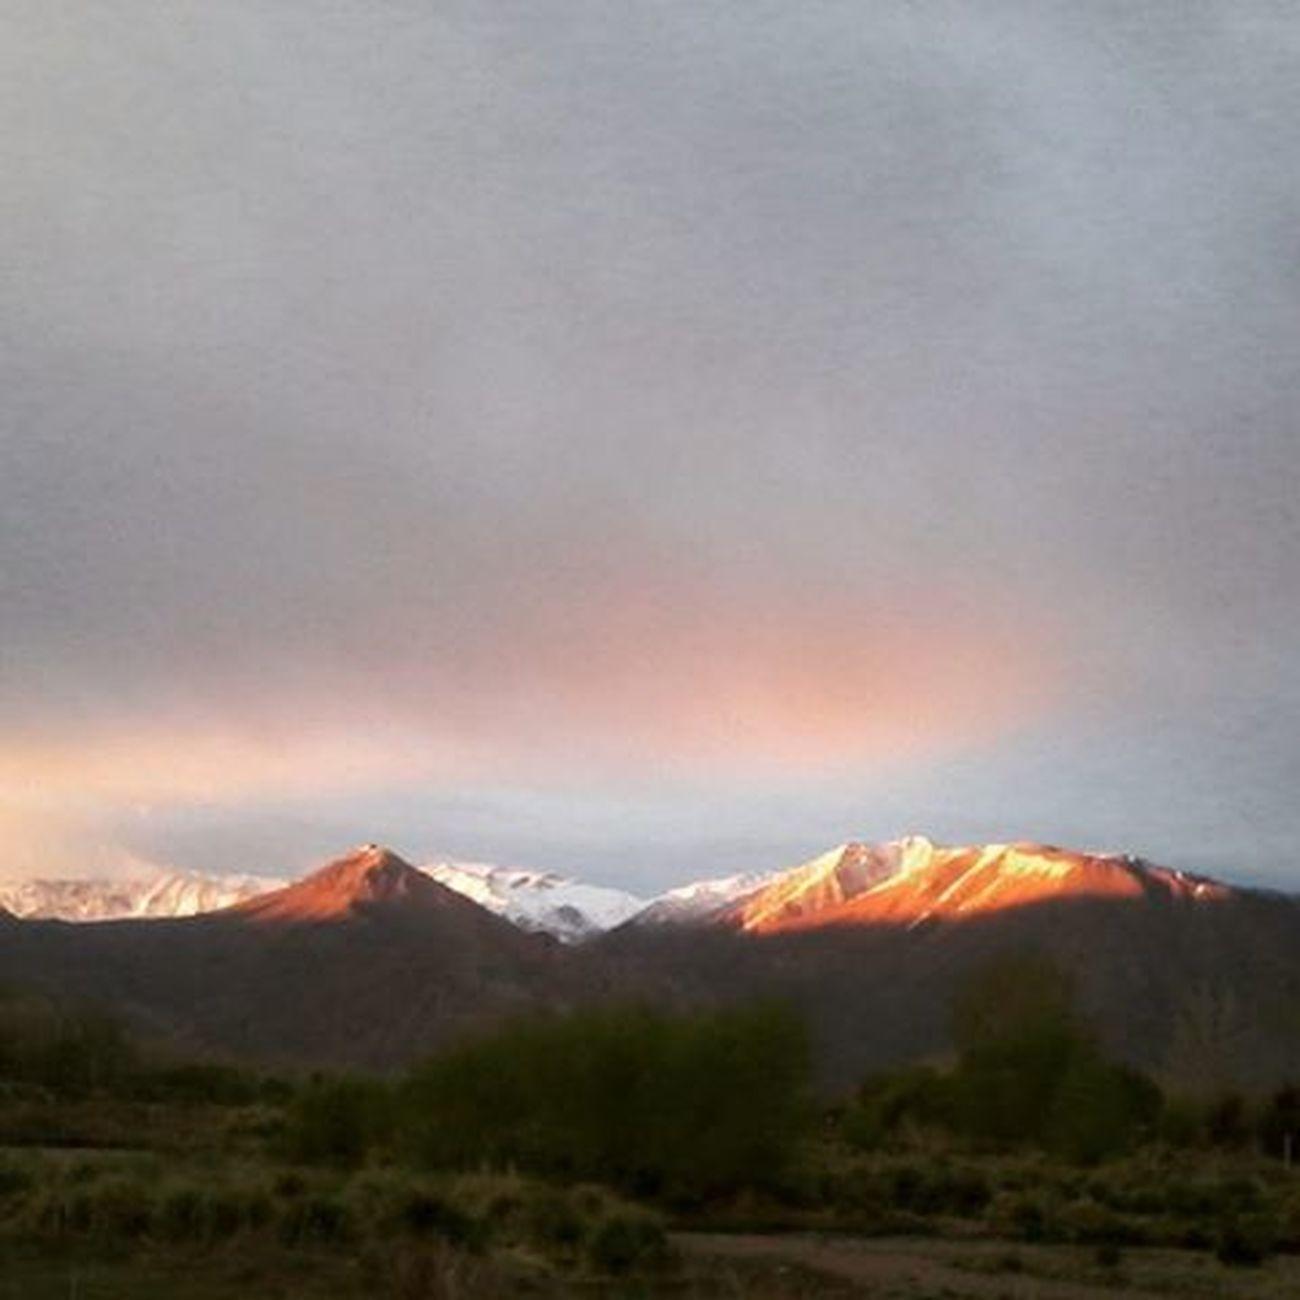 Madrugando en uspallata!!! InTheMorning Beautyplace Mountains Paisaje Tengosueño Caradehuevofrito Peronomeimporta Yehet hehe